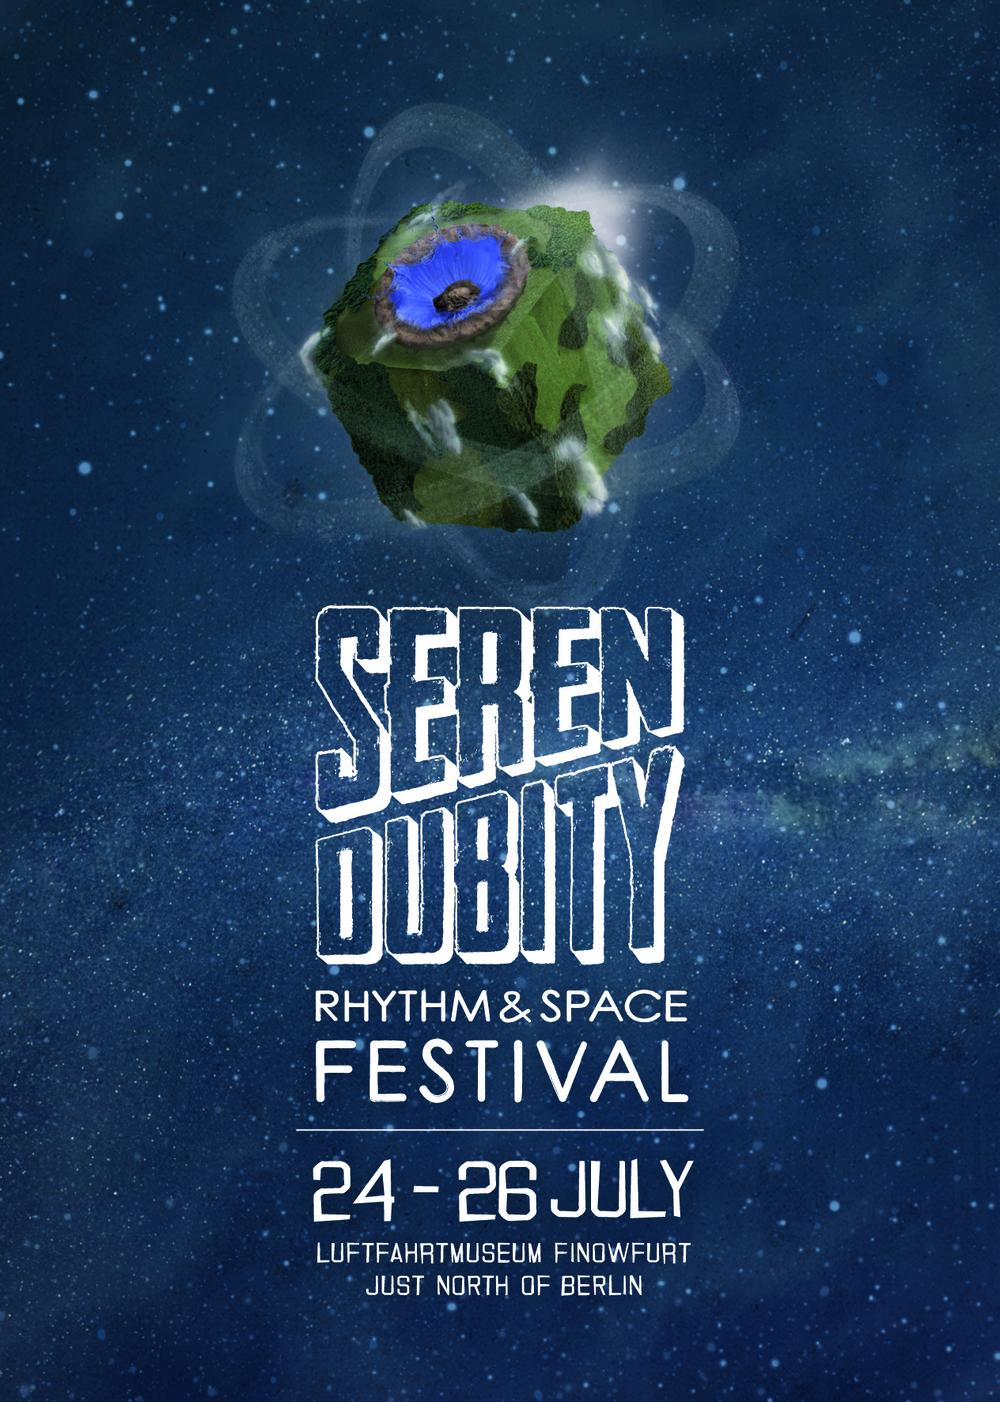 Serendubity - Rhythm & Space Festival - 2015 - Flyer - Front.jpg